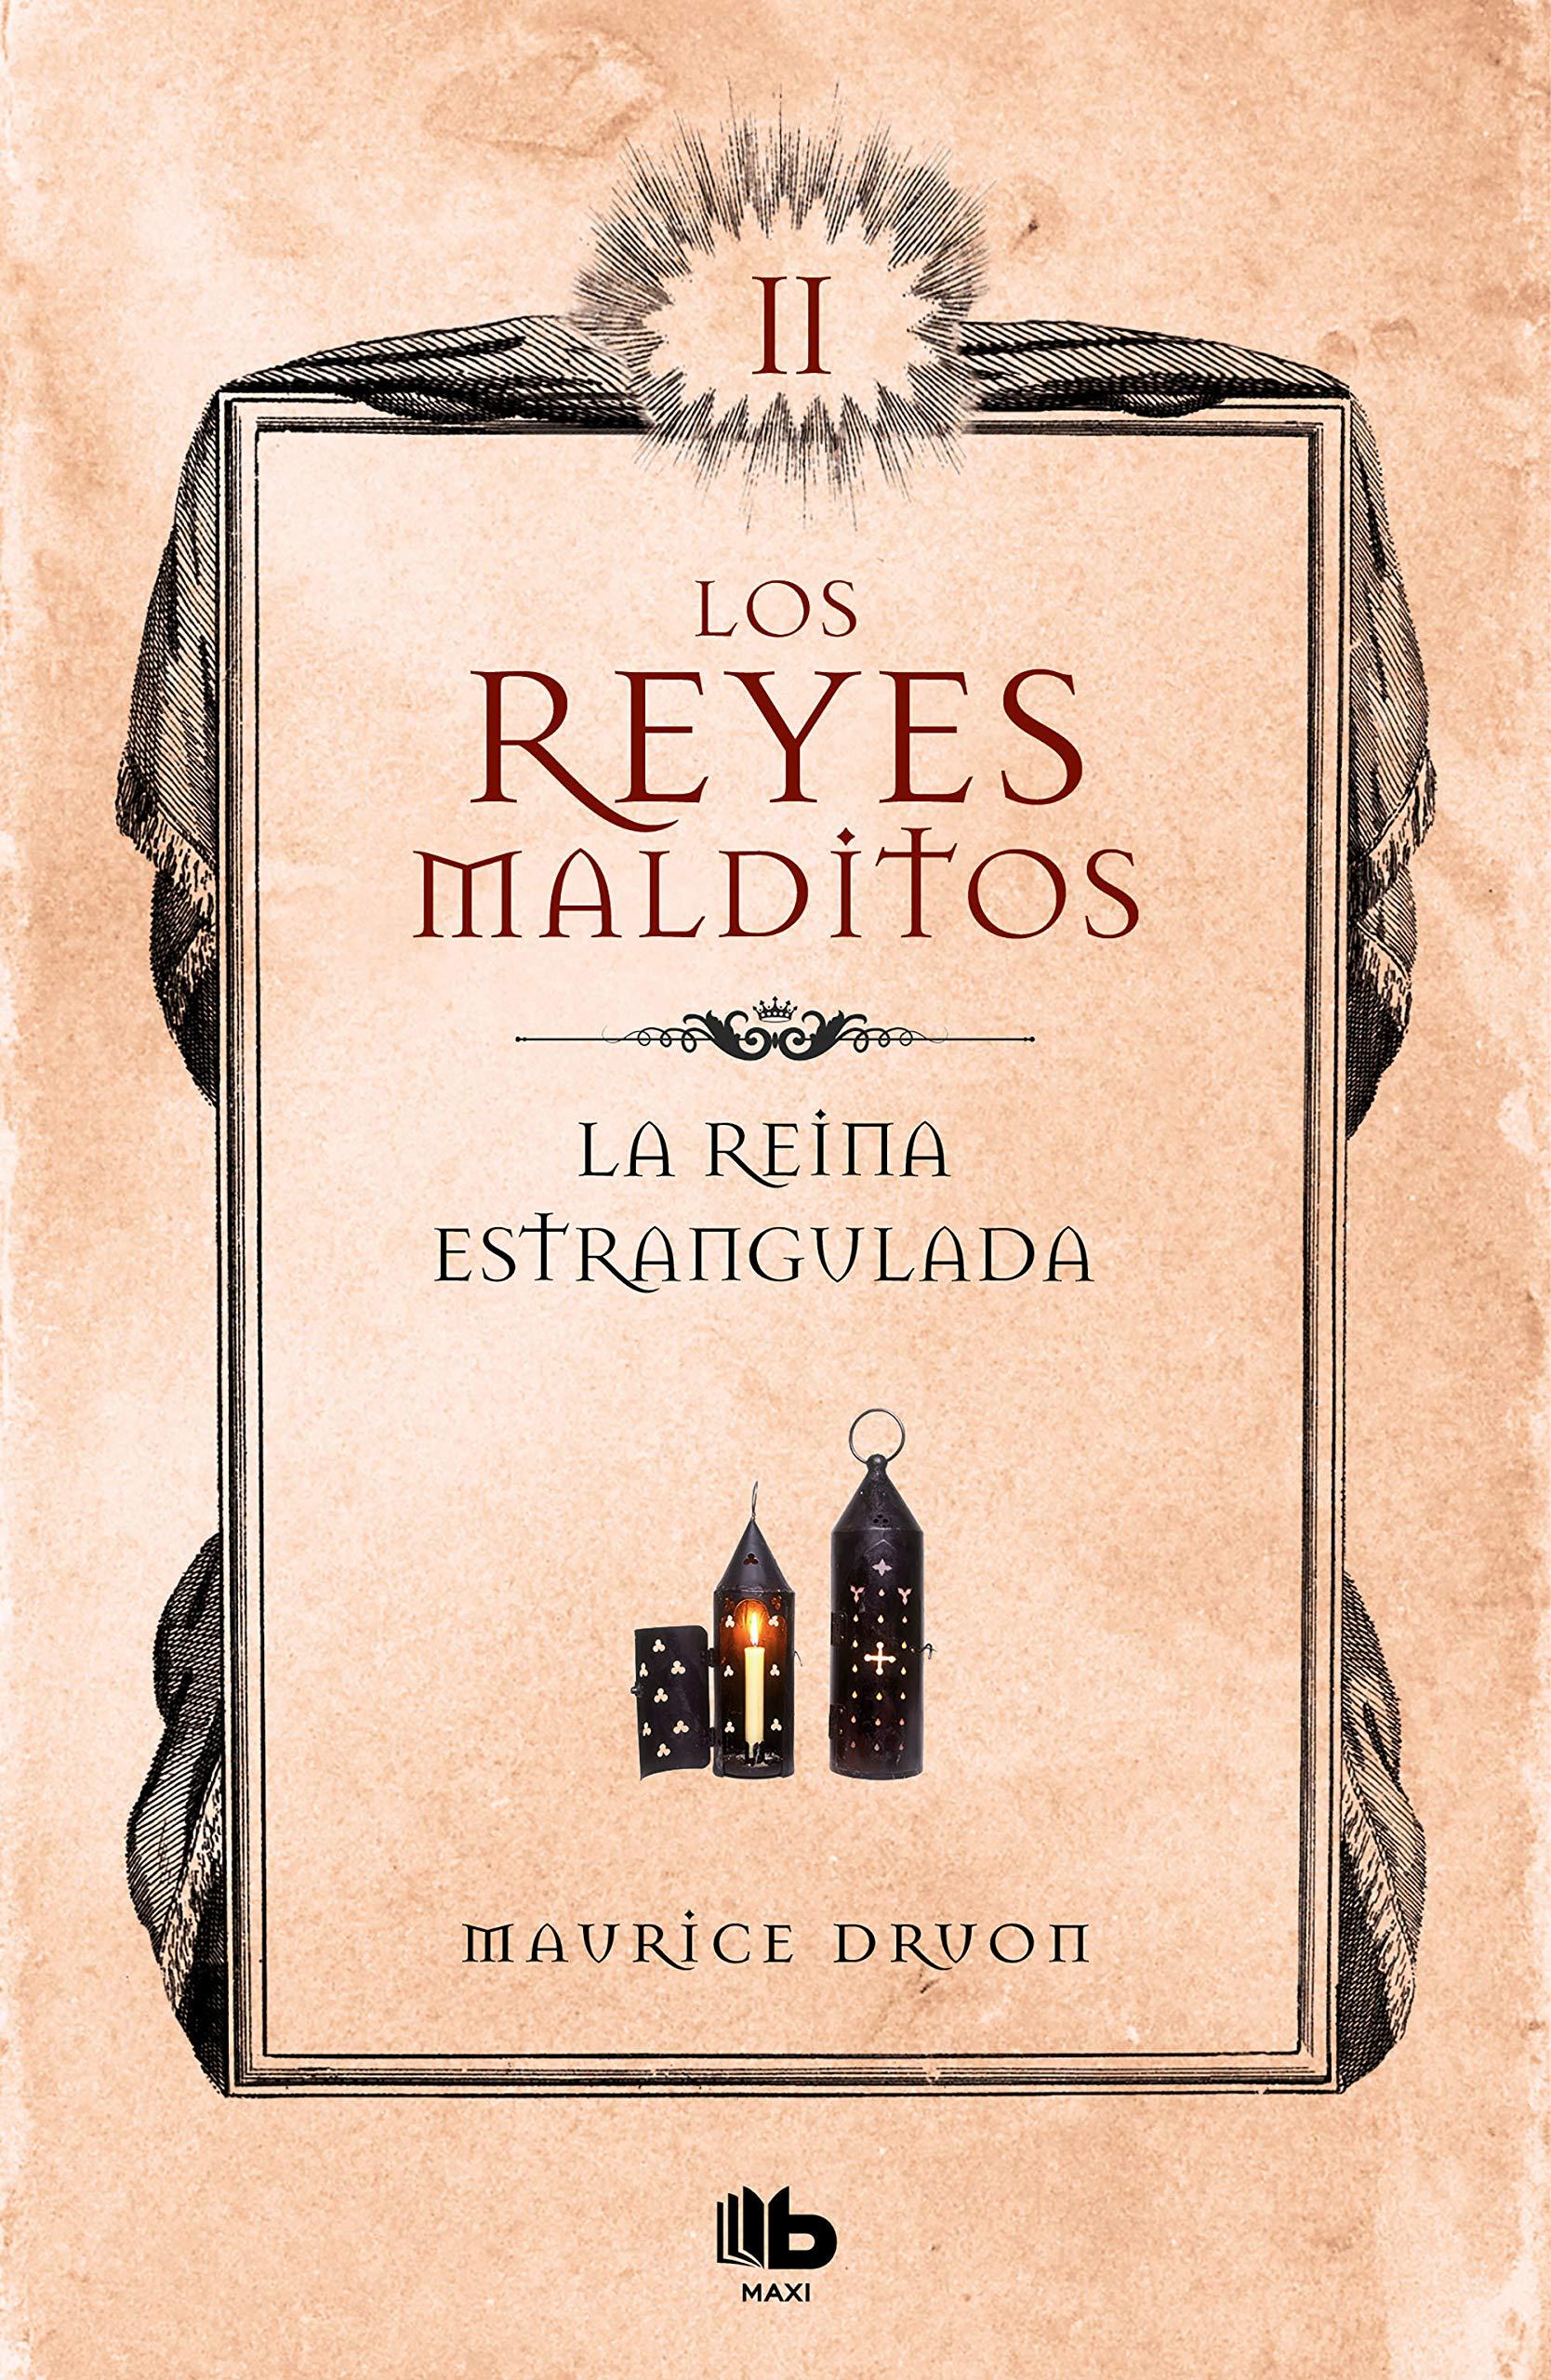 La reina estrangulada (Los Reyes Malditos 2): Amazon.es: Druon, Maurice, Mª GUADALUPE OROZCO BRAVO;: Libros